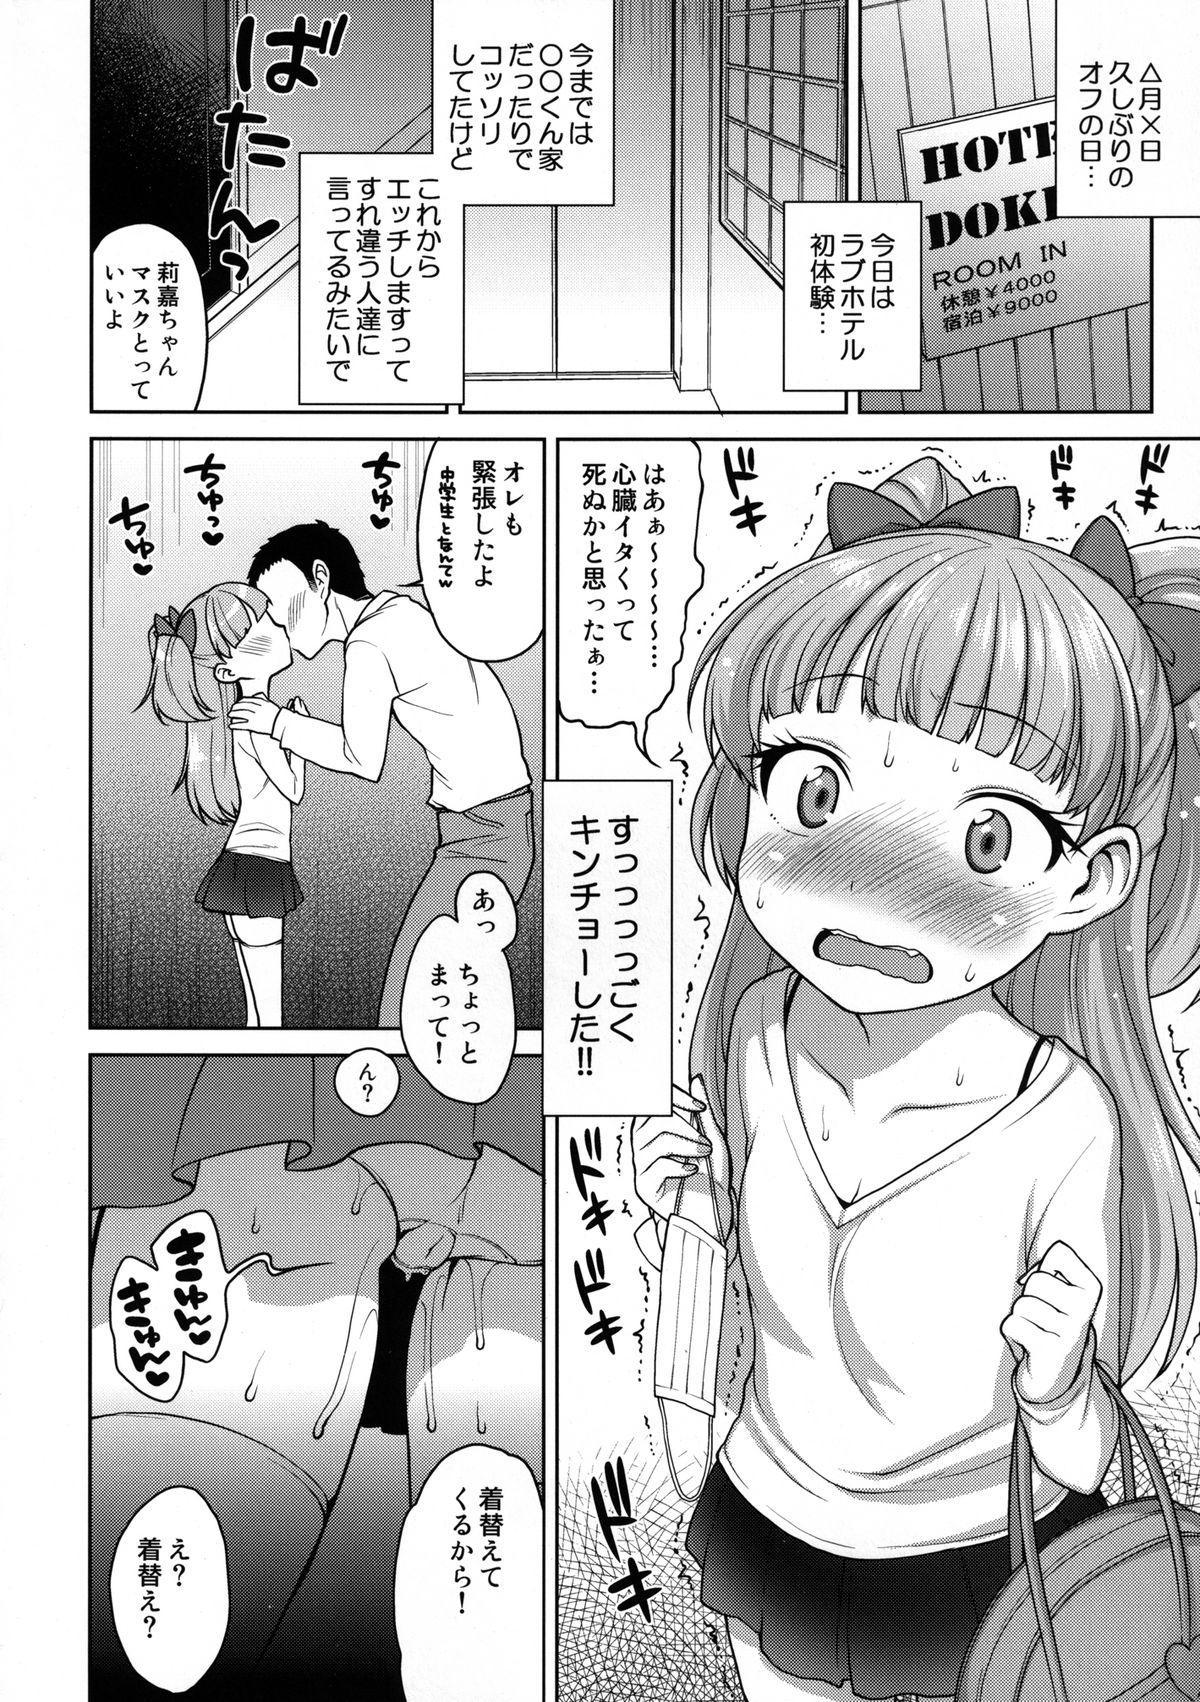 Rika-chan Kawaii 14